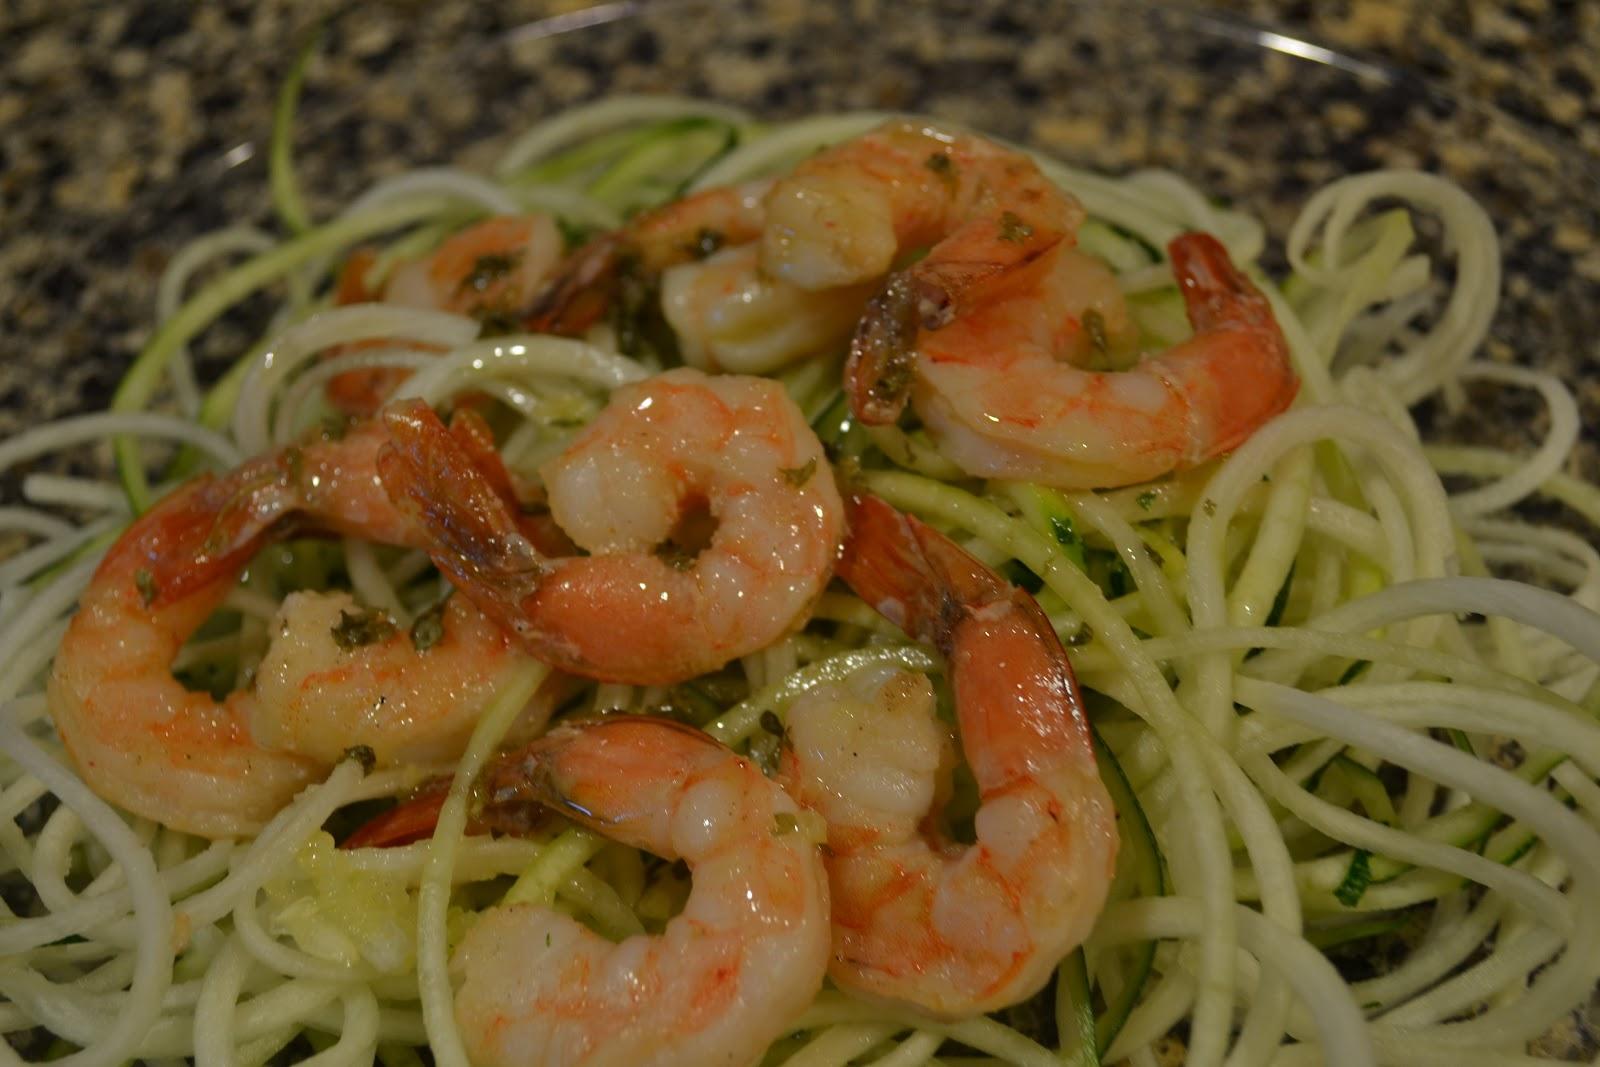 shrimp scampi with zucchini pasta 10 15 shrimp per person